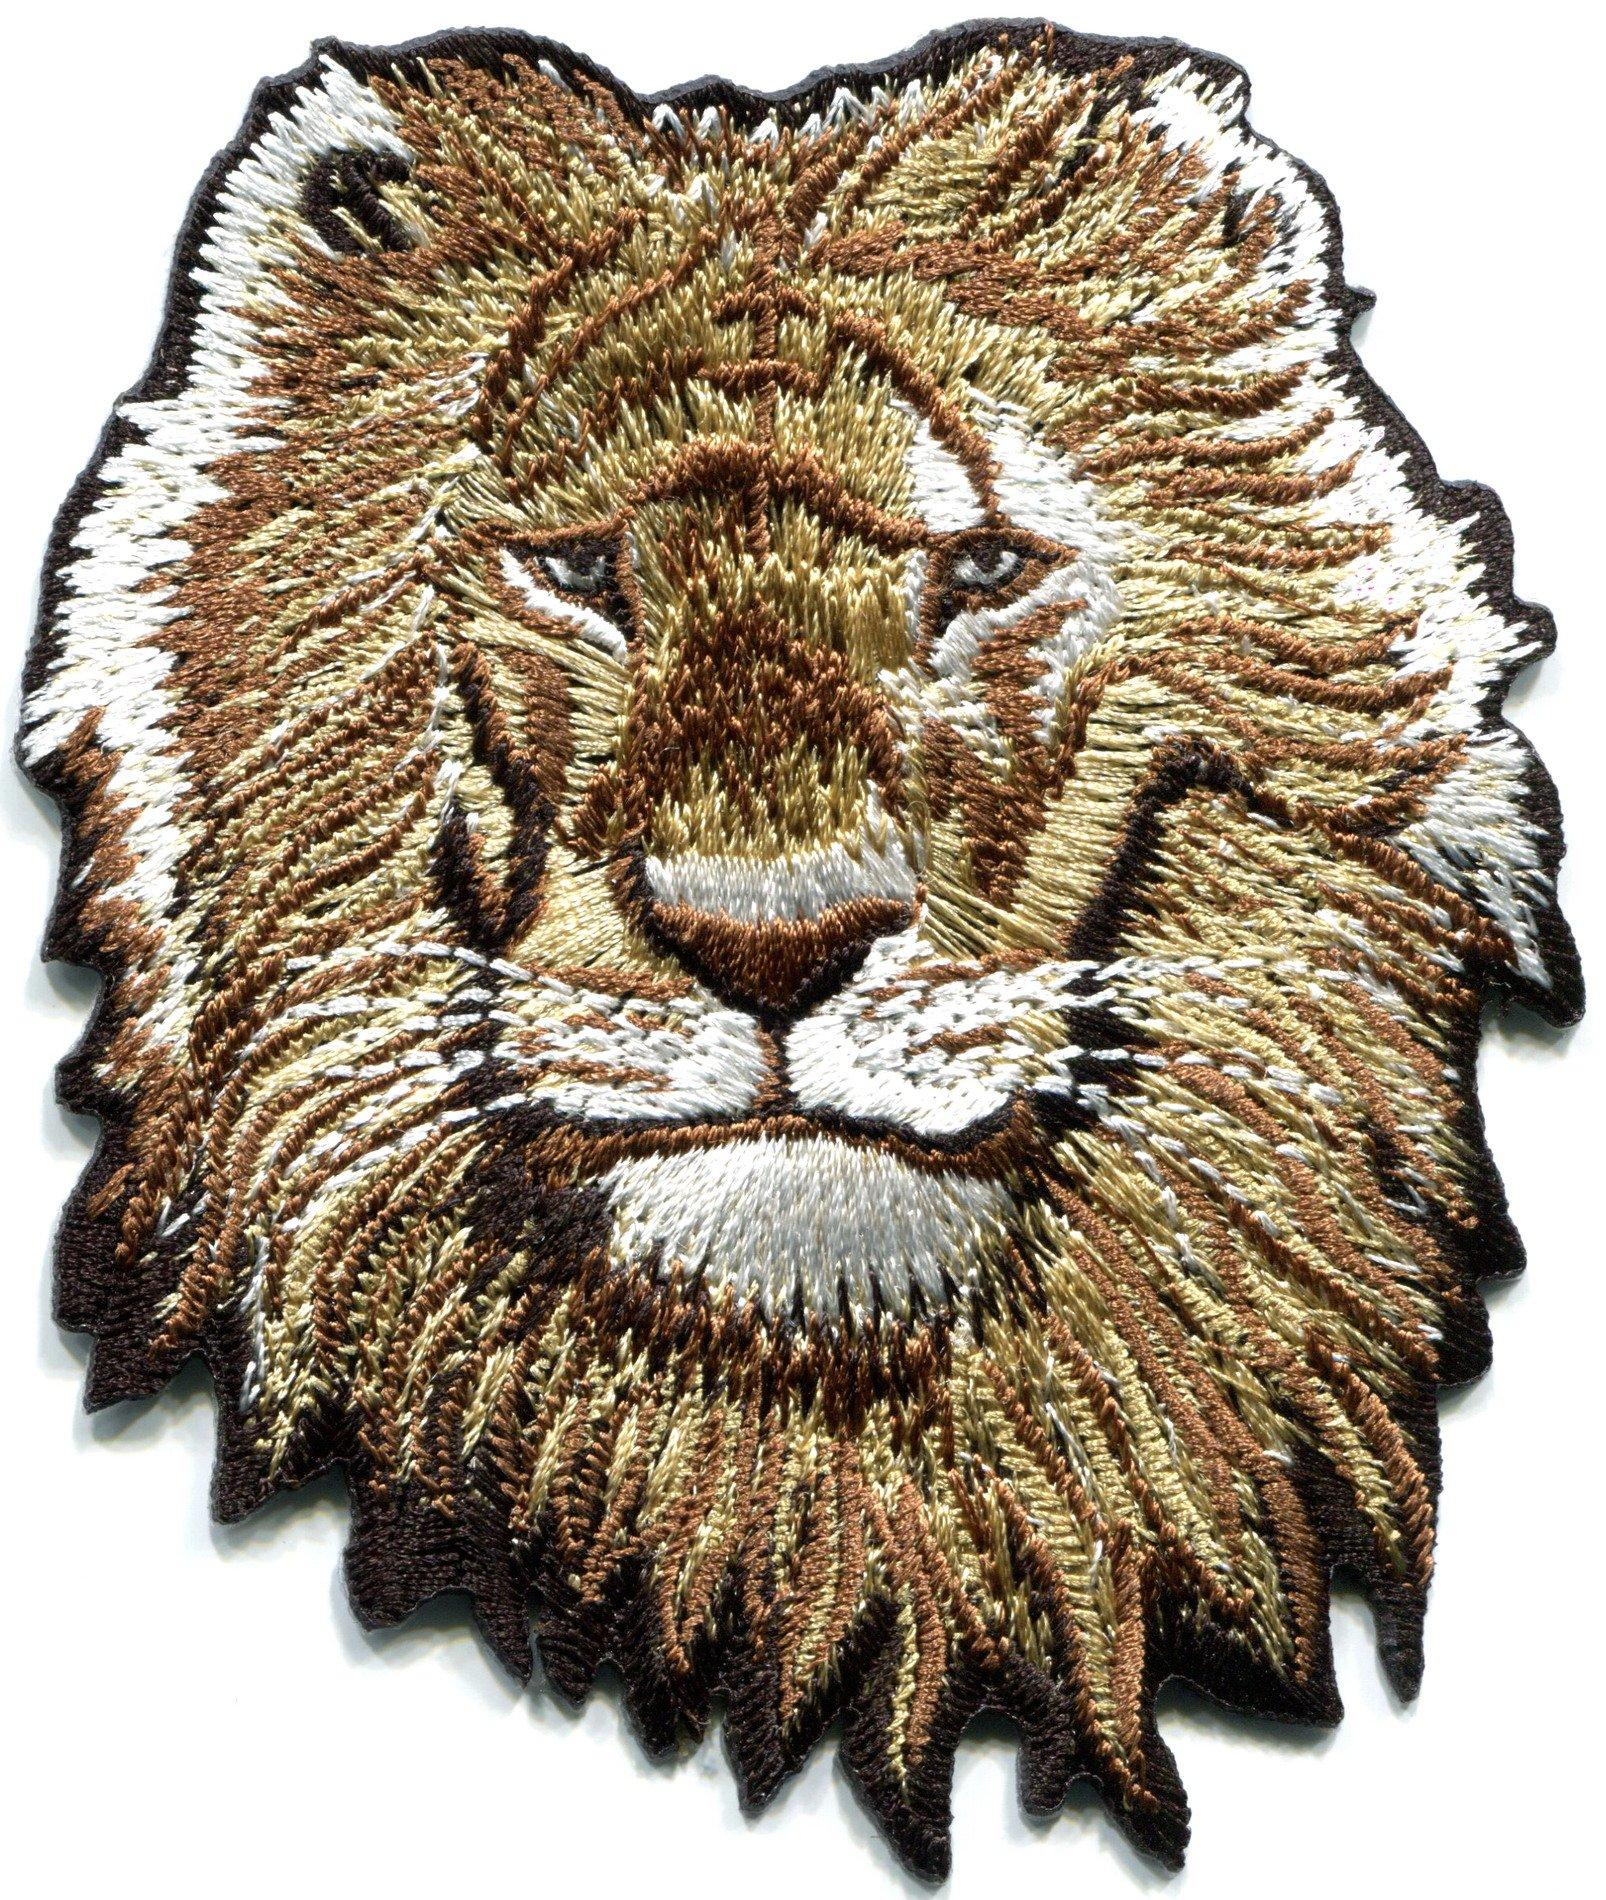 Lion cat Puma Jaguar Tiger Cheetah Animal Wildlife Predator Embroidered Applique Iron-on Patch S-587